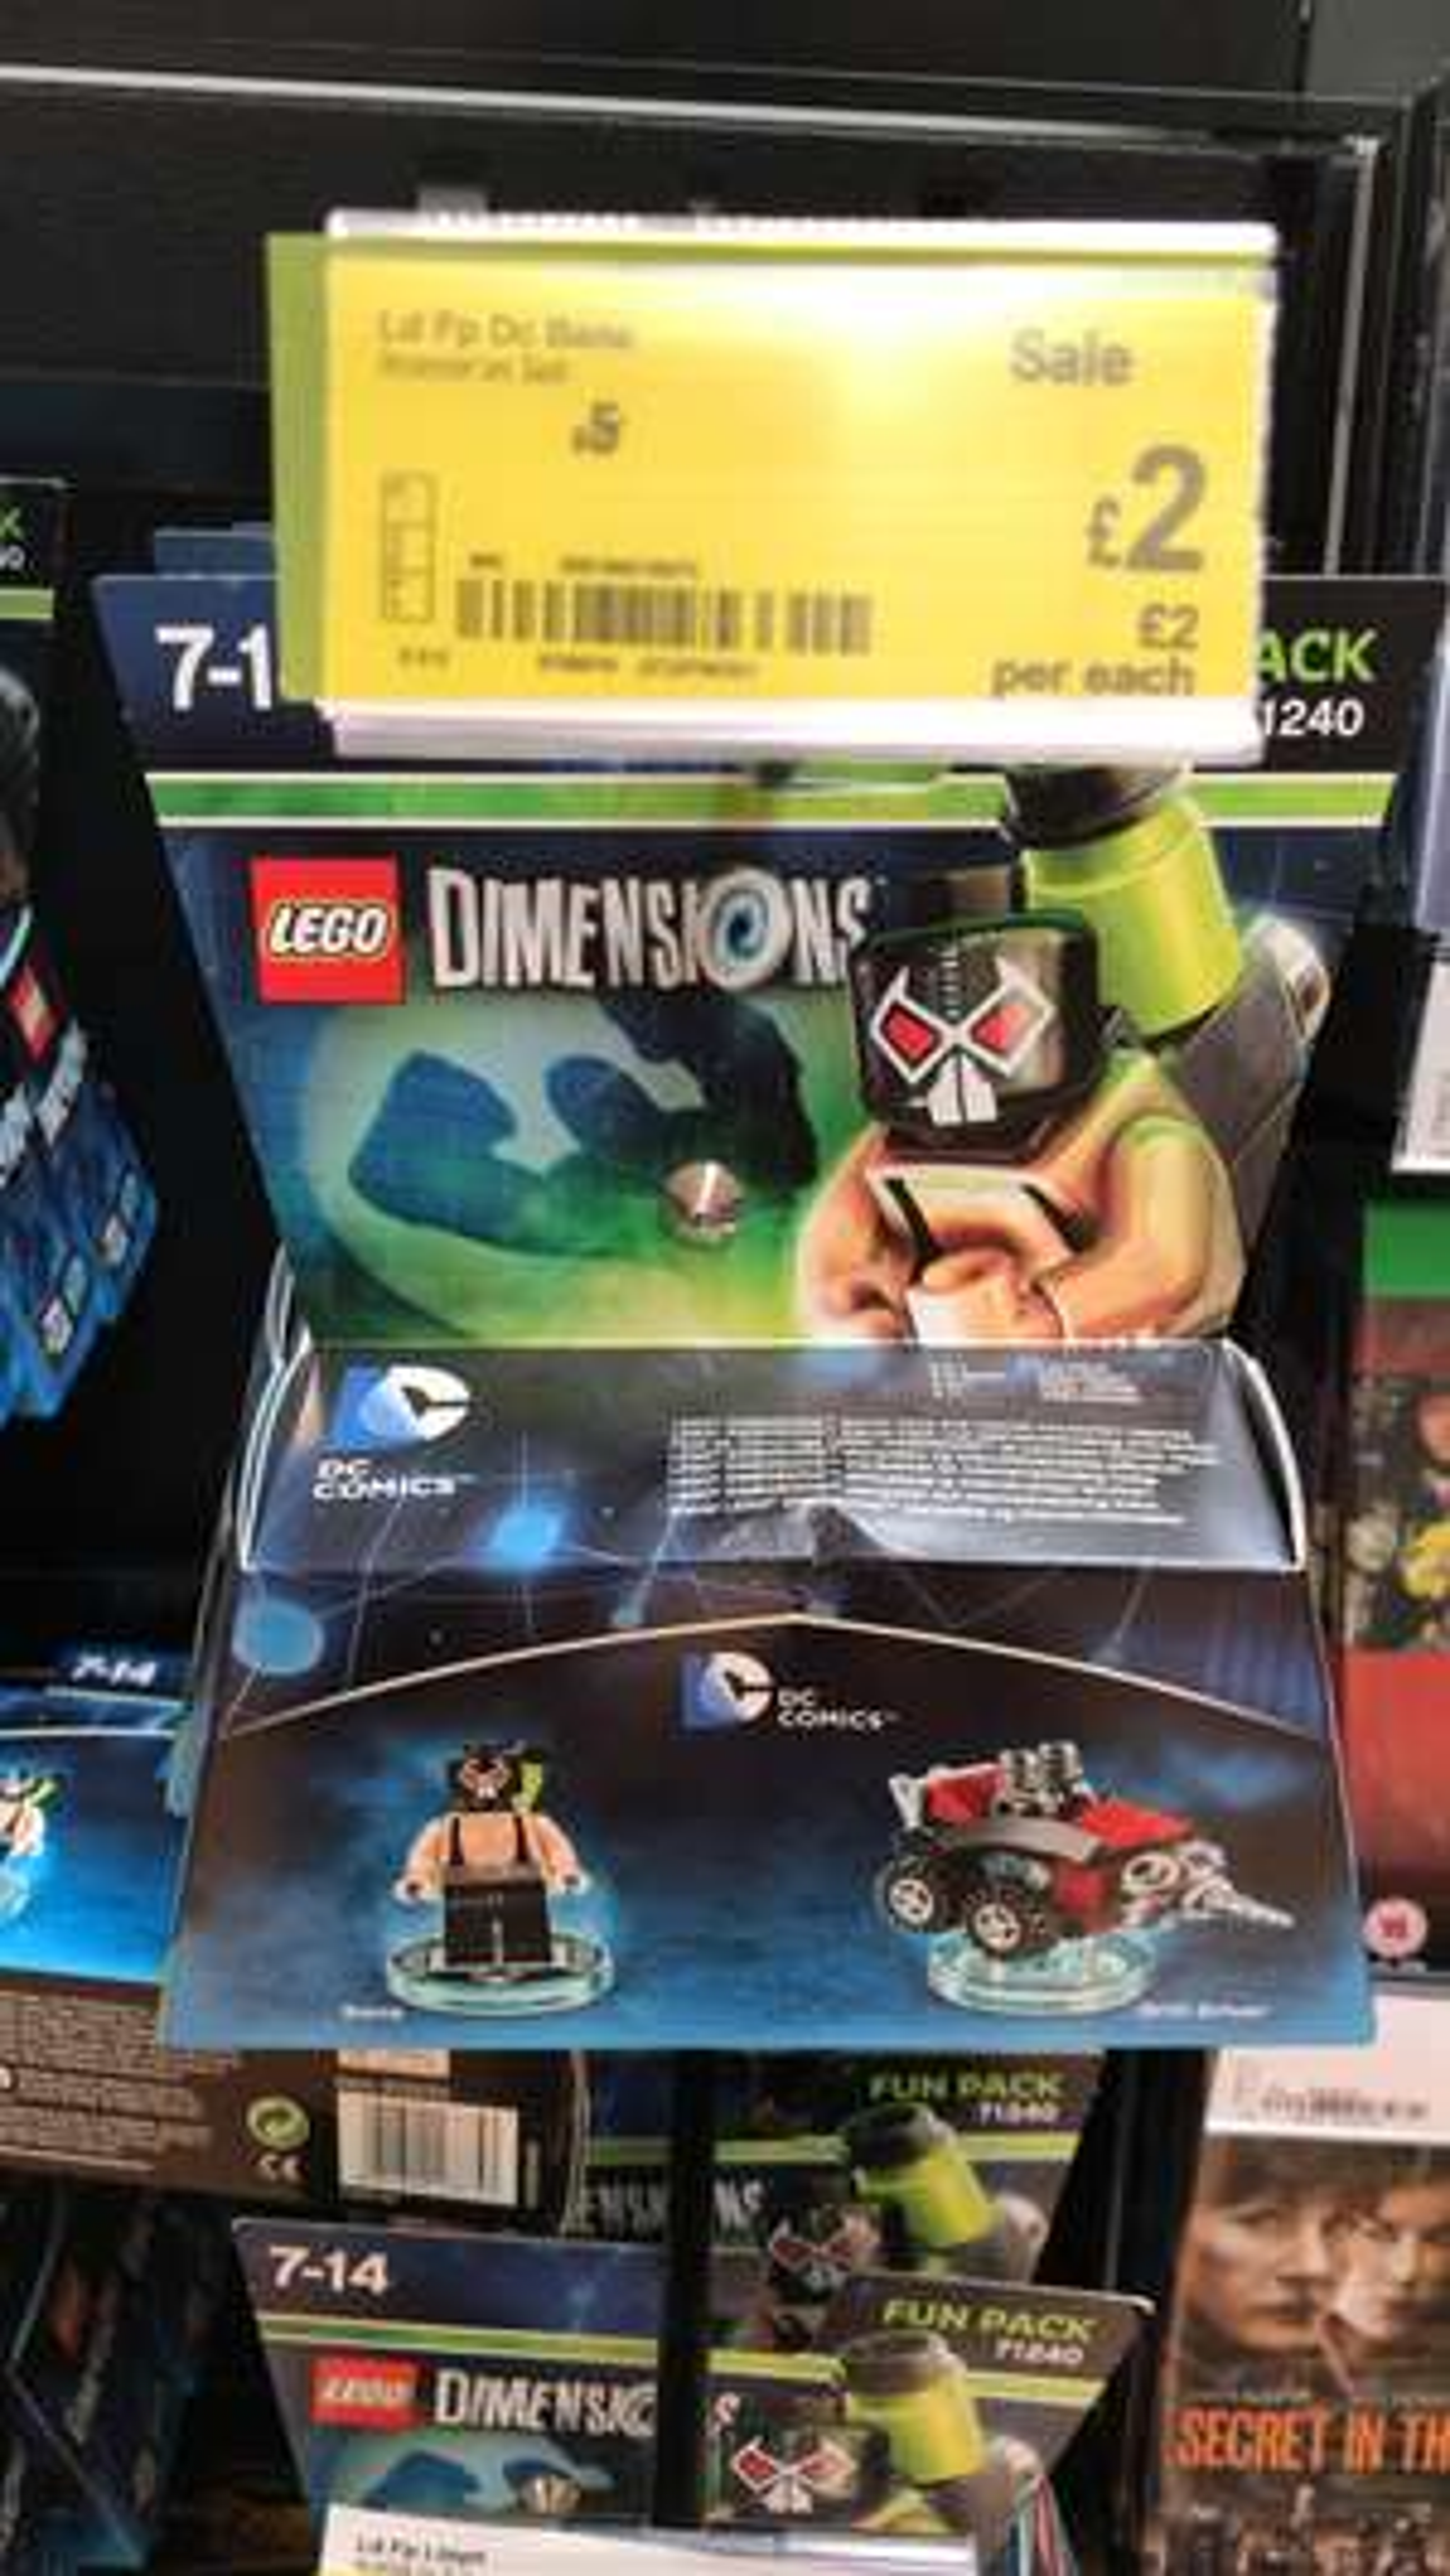 Lego dimensions fun packs £2 in Asda. PS4 Xbox